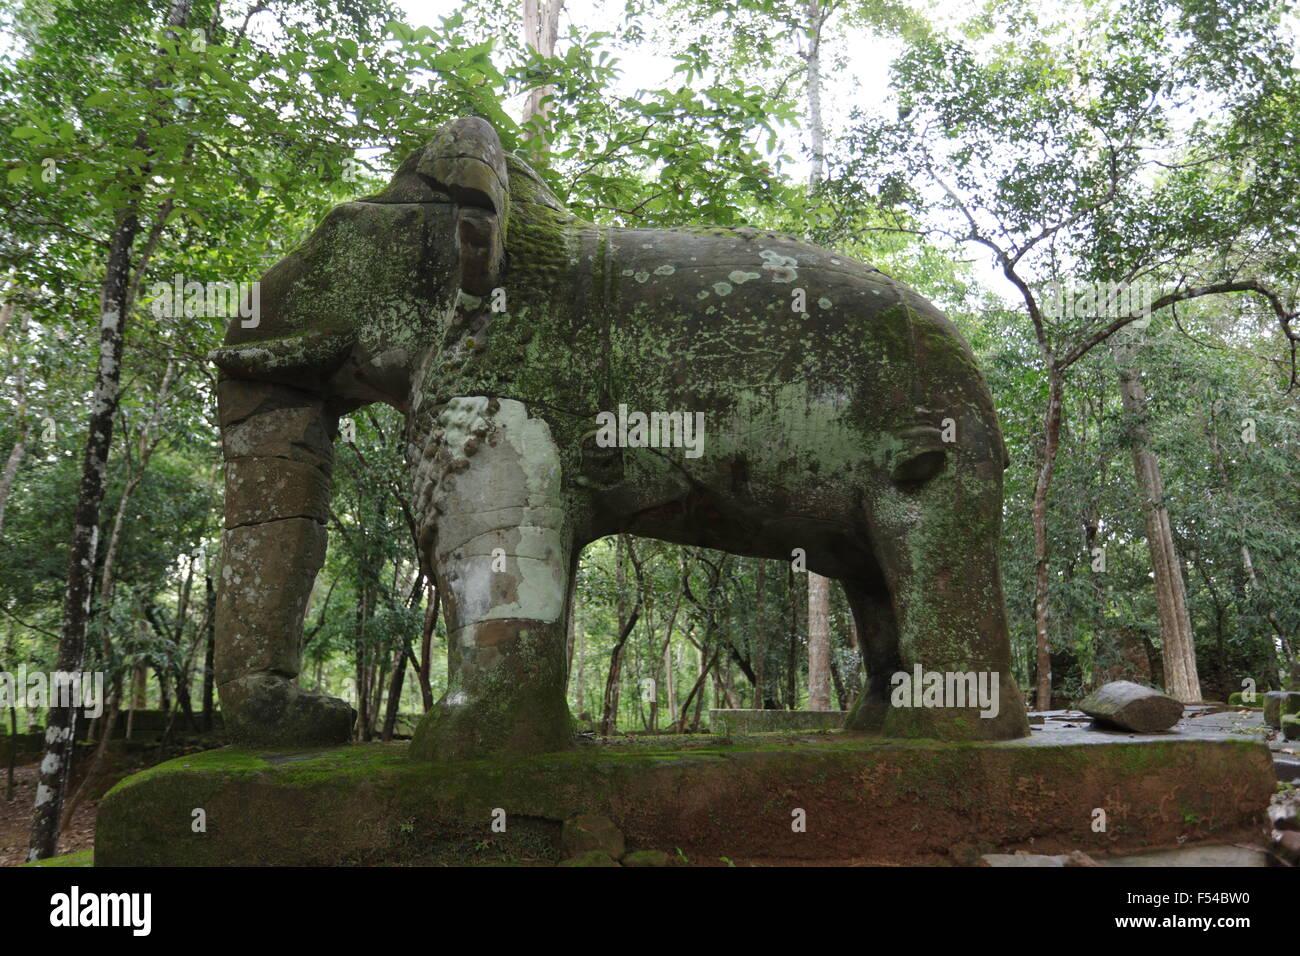 Elephant in Koh Ker temples, Cambodia.Stock Photo